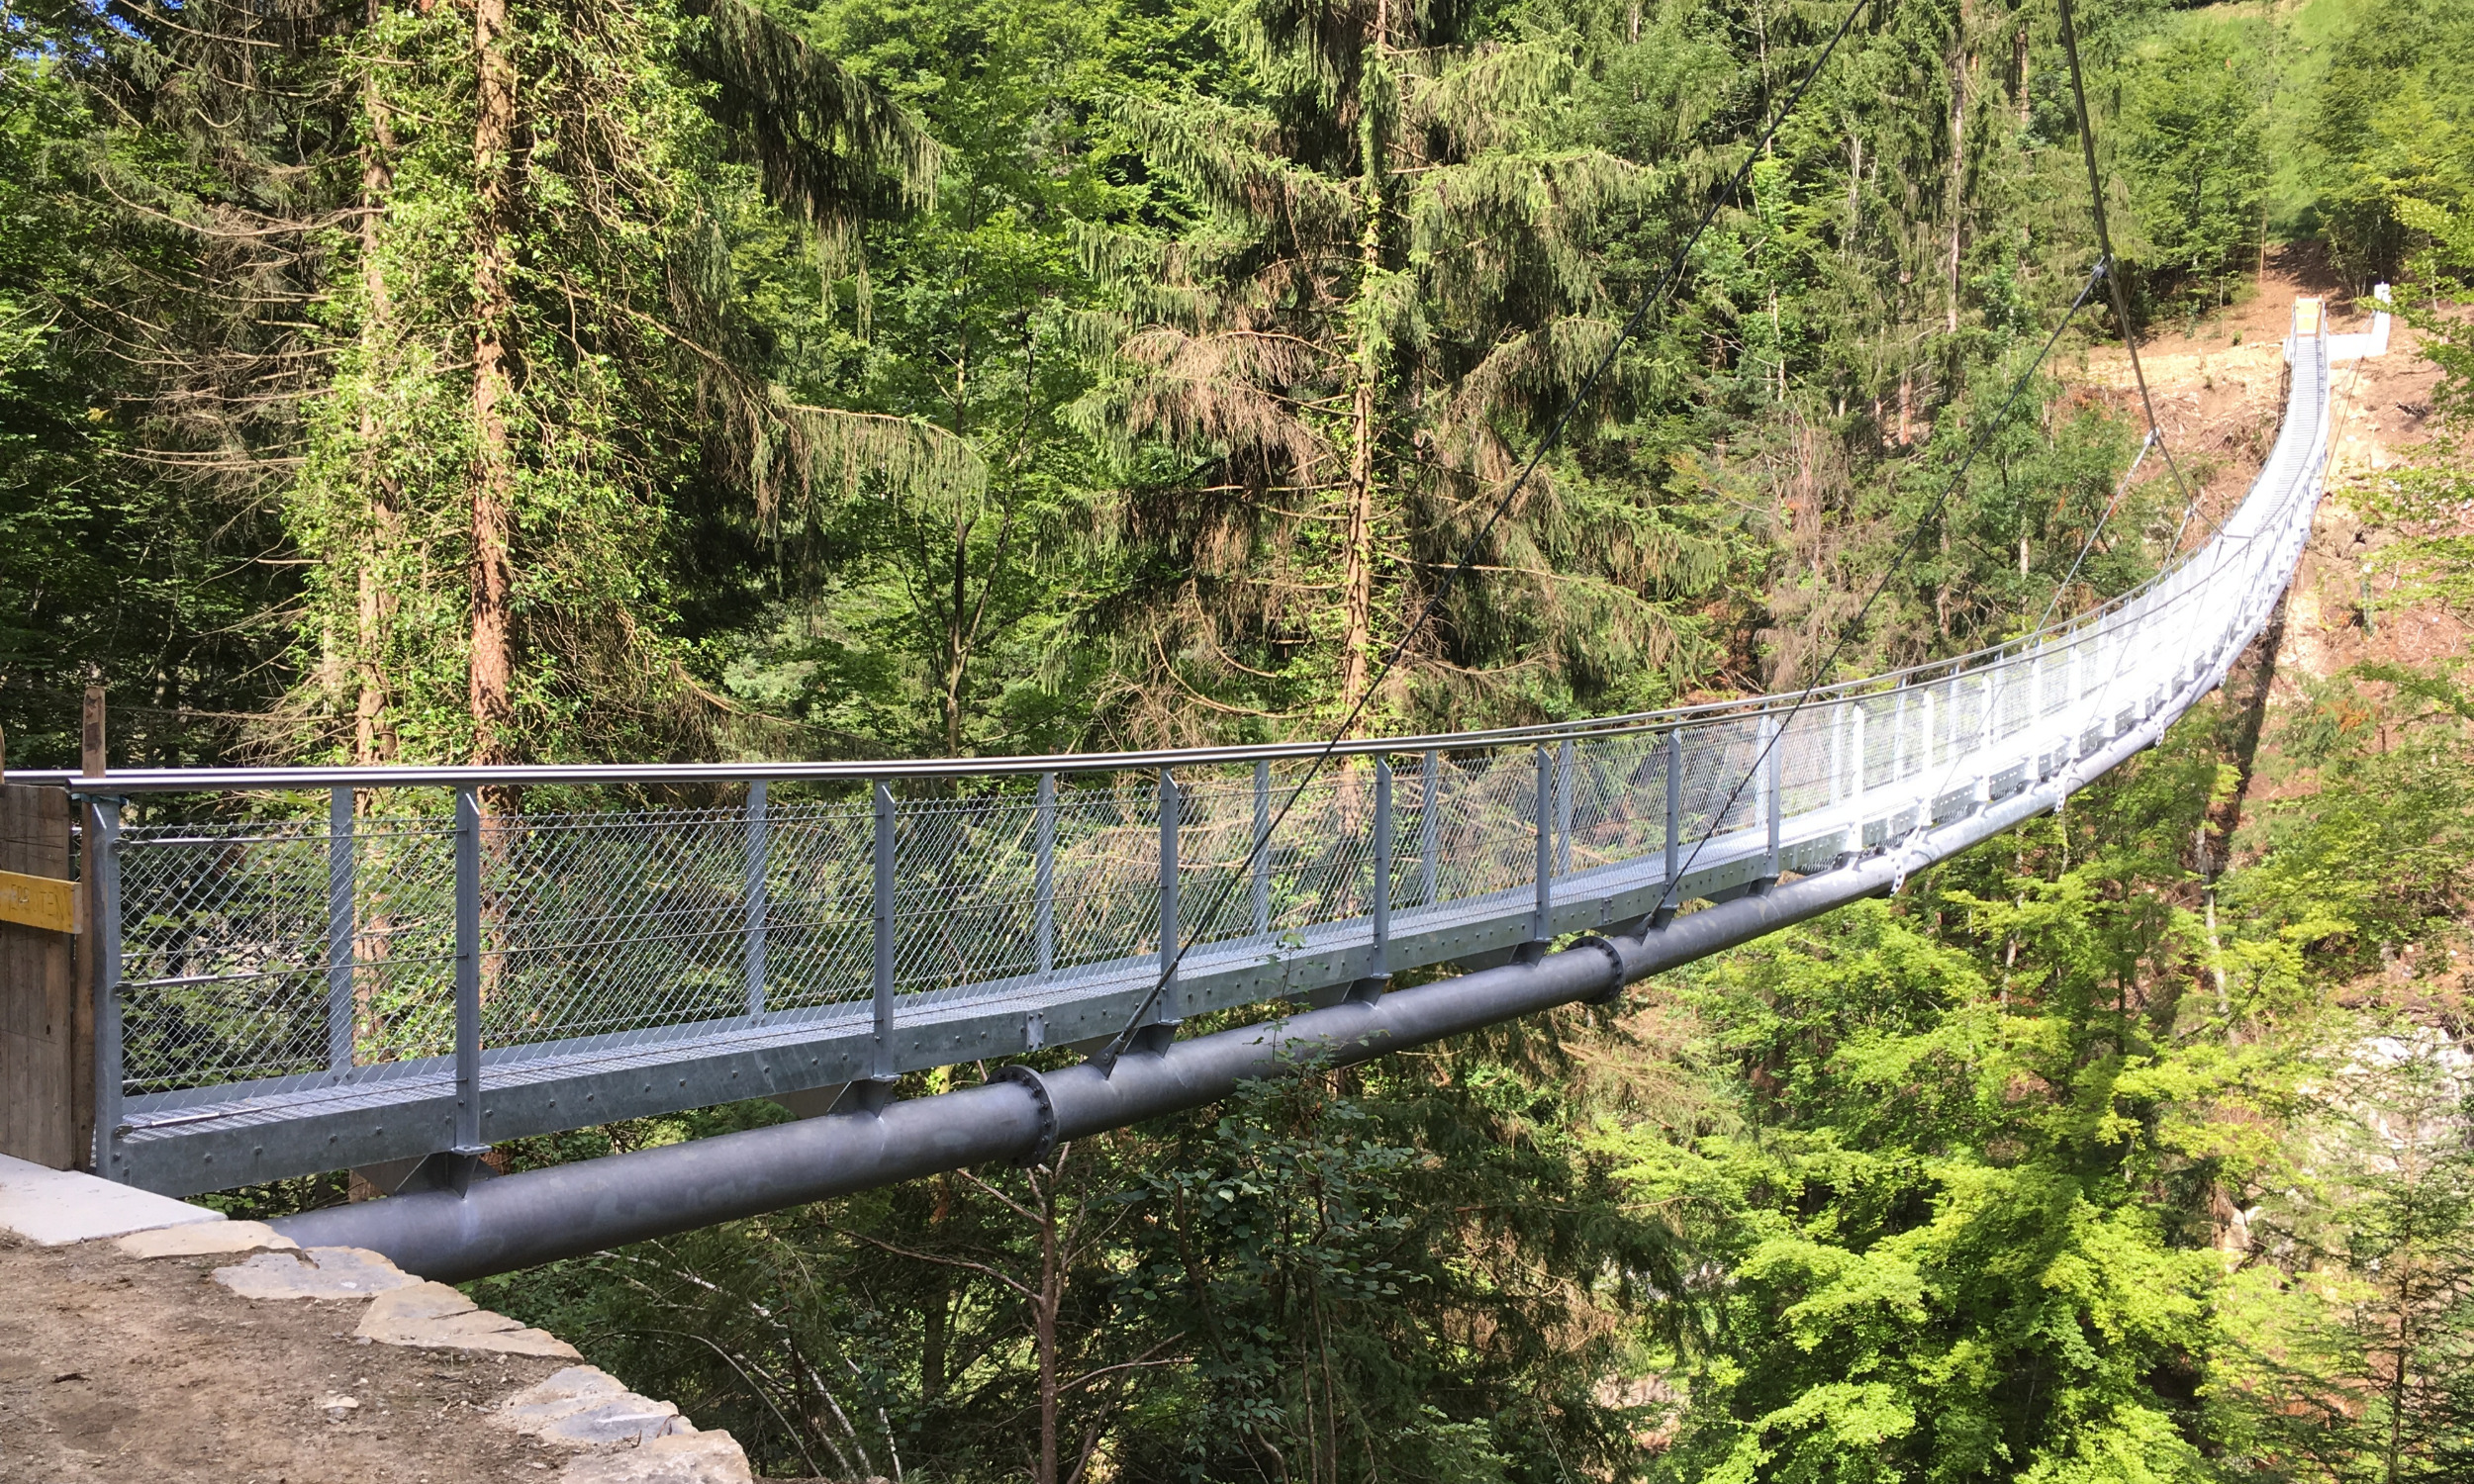 Hängebrücke Sundbach